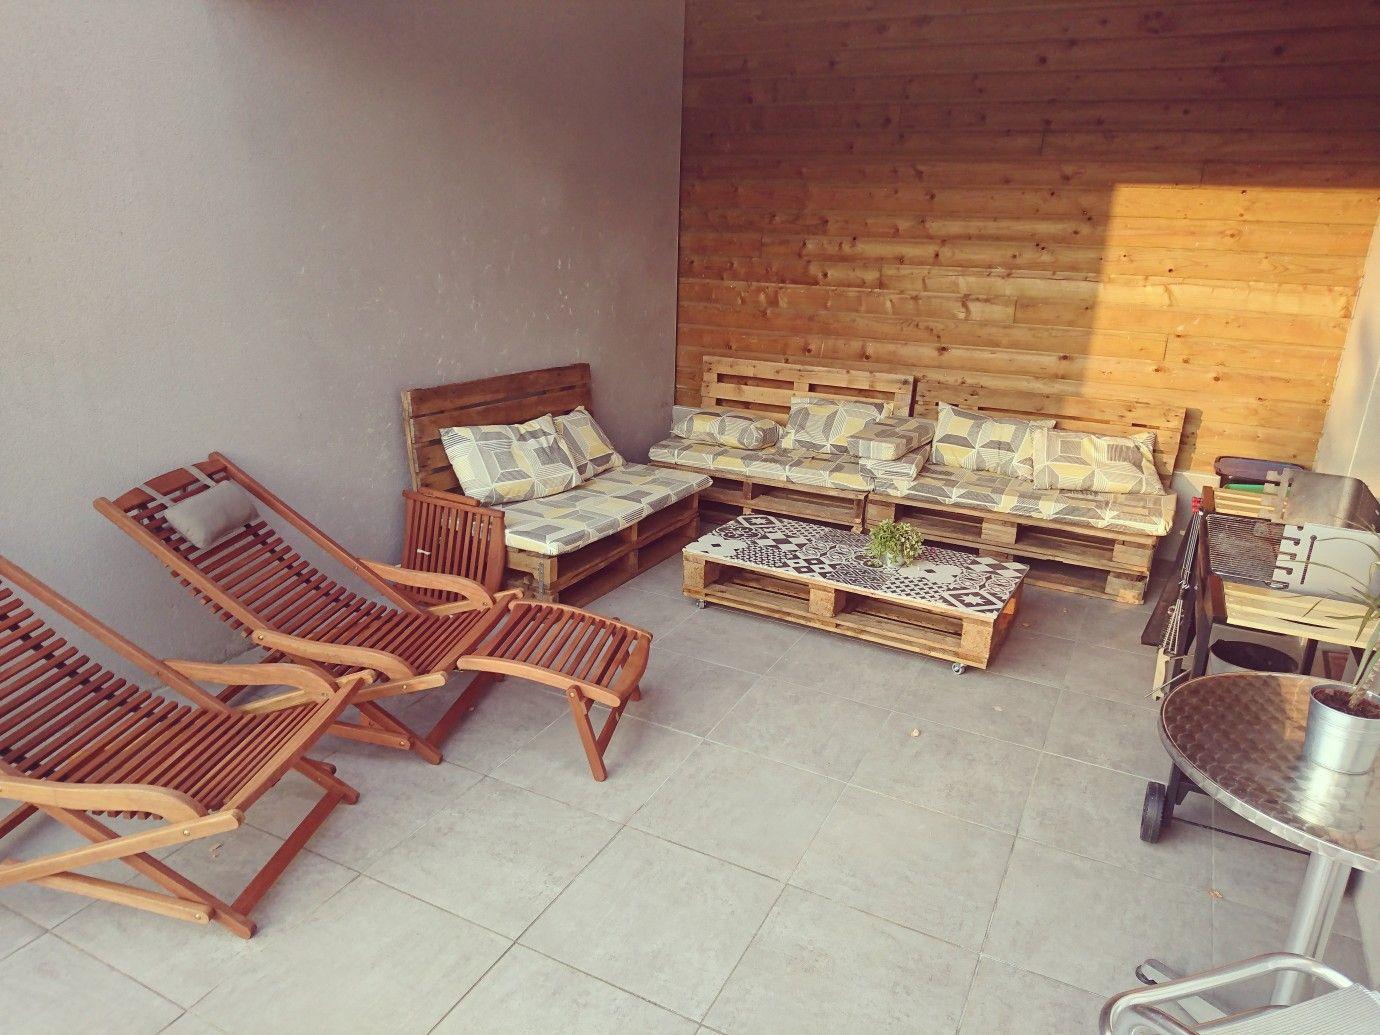 terrasse carrel e salon de jardin en palette table basse. Black Bedroom Furniture Sets. Home Design Ideas